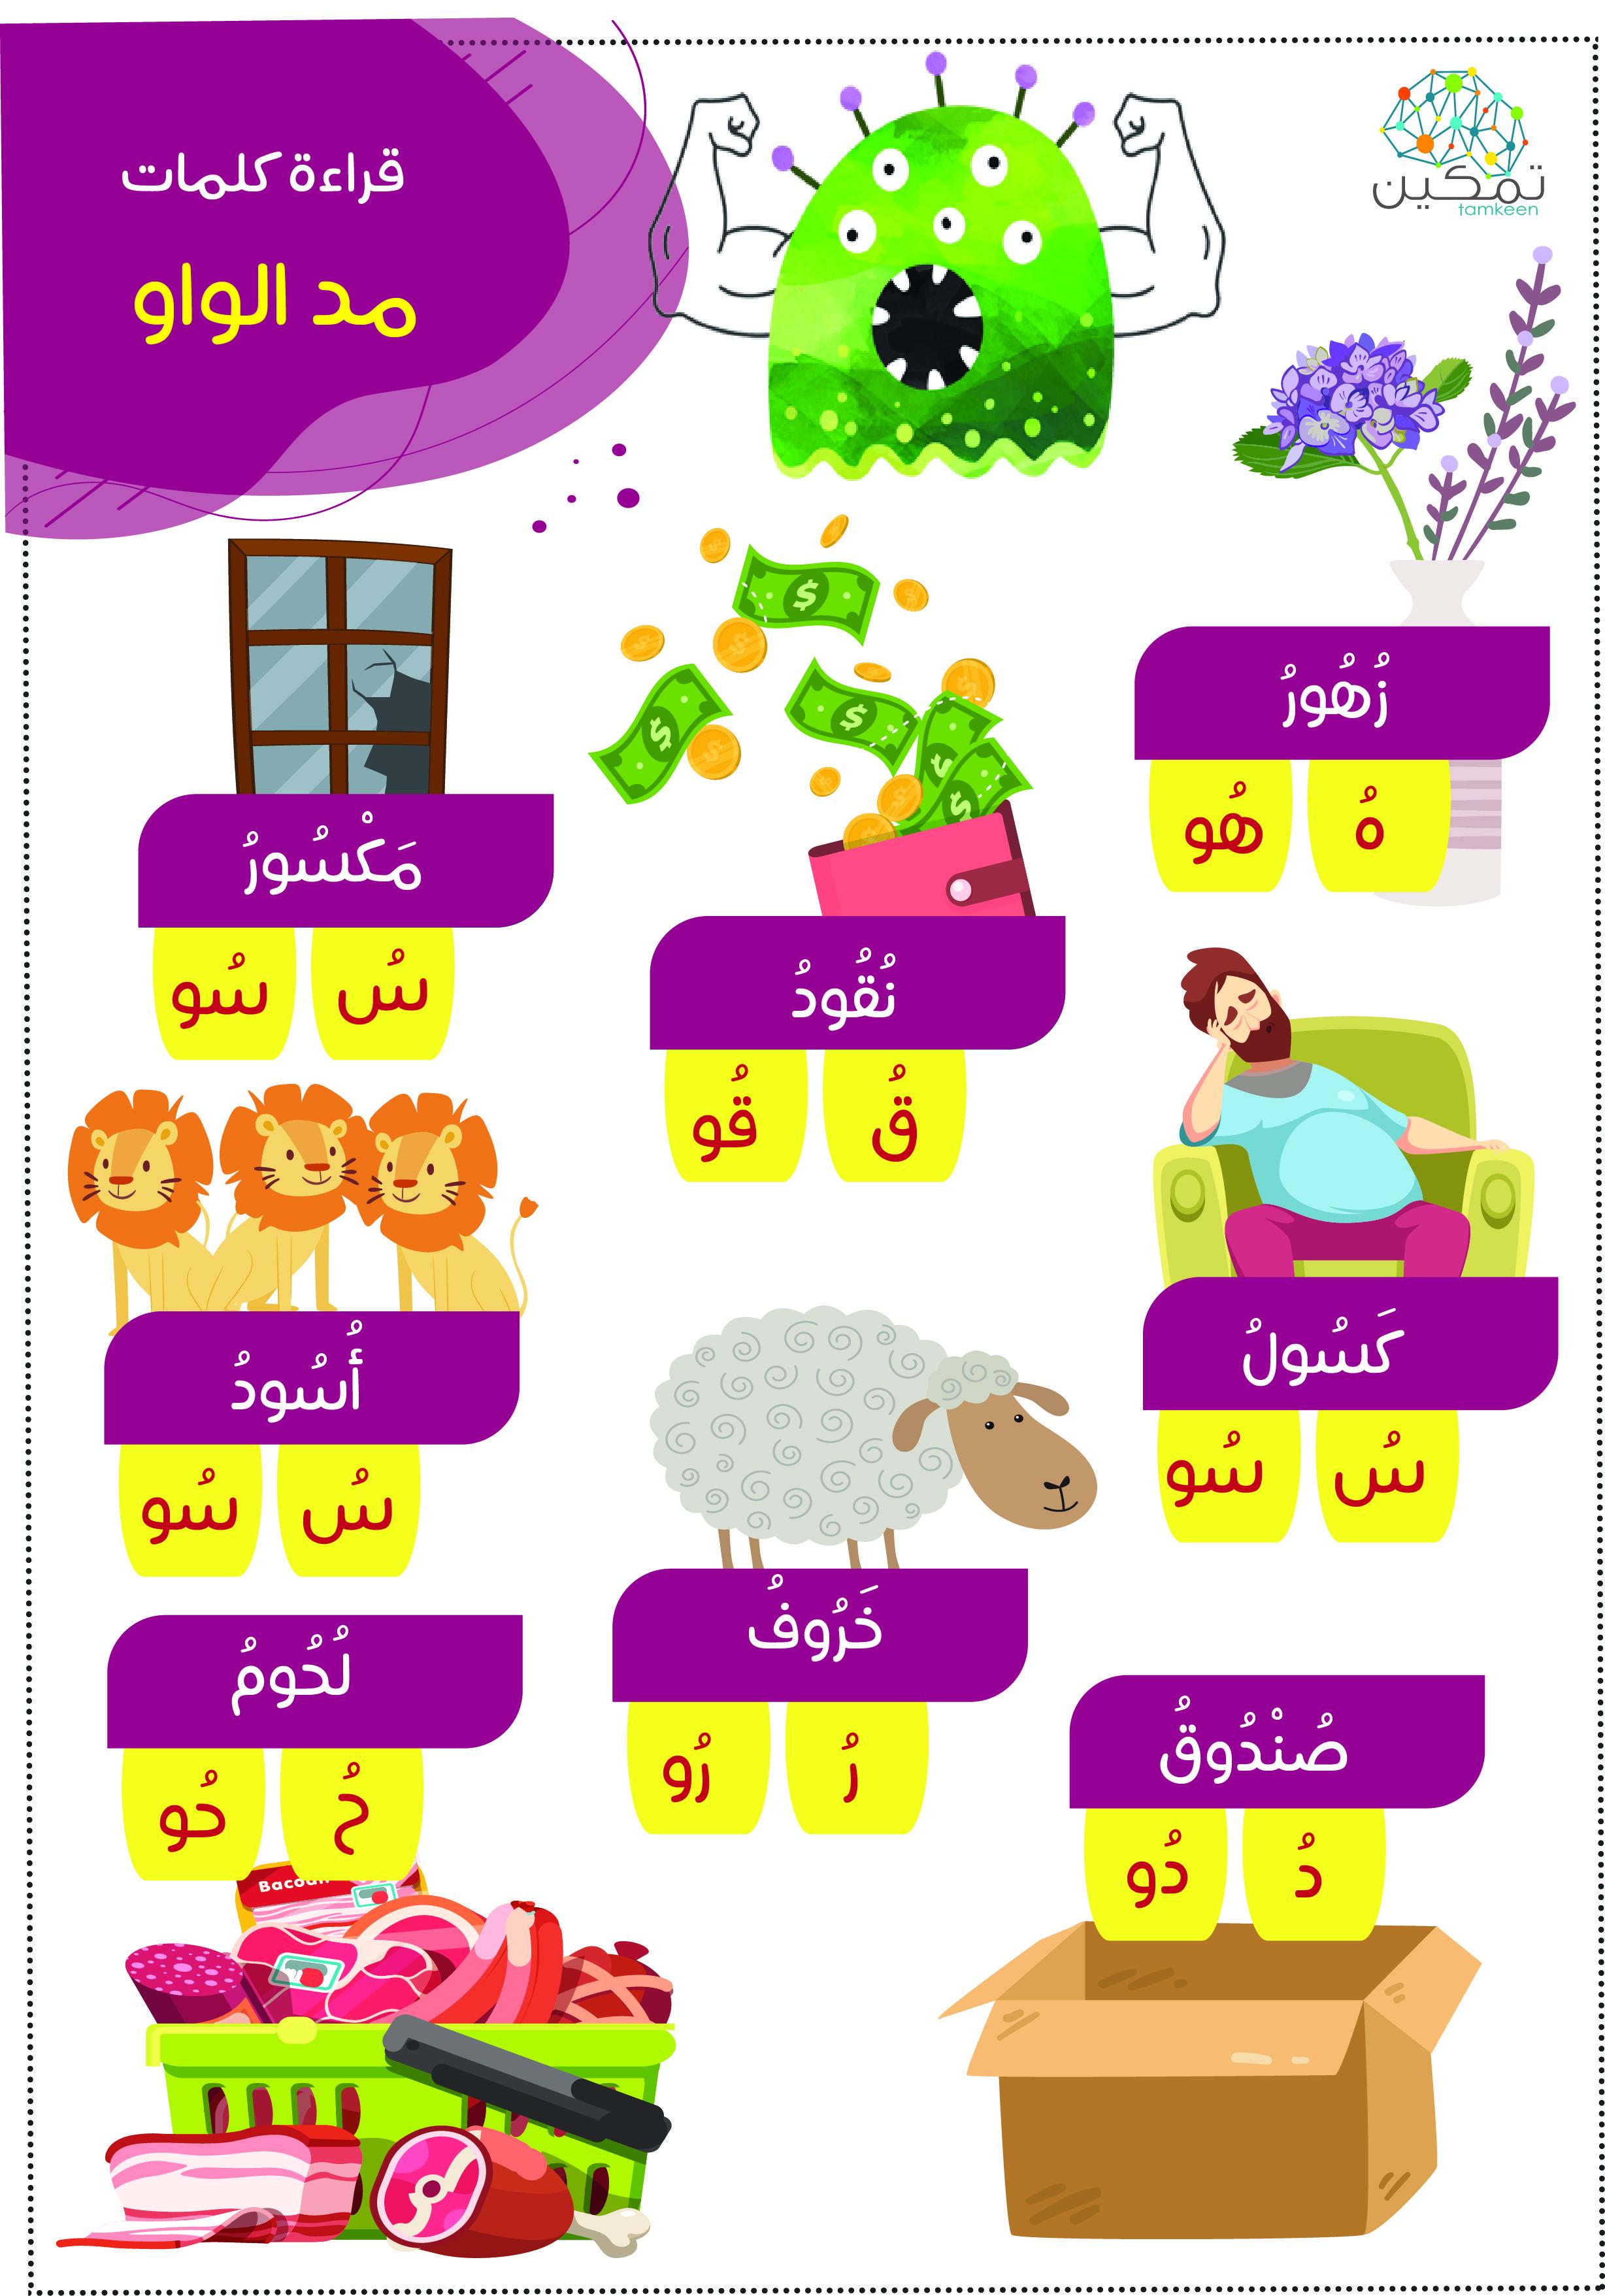 مد الواو Arabic Alphabet For Kids Learning Arabic Arabic Kids